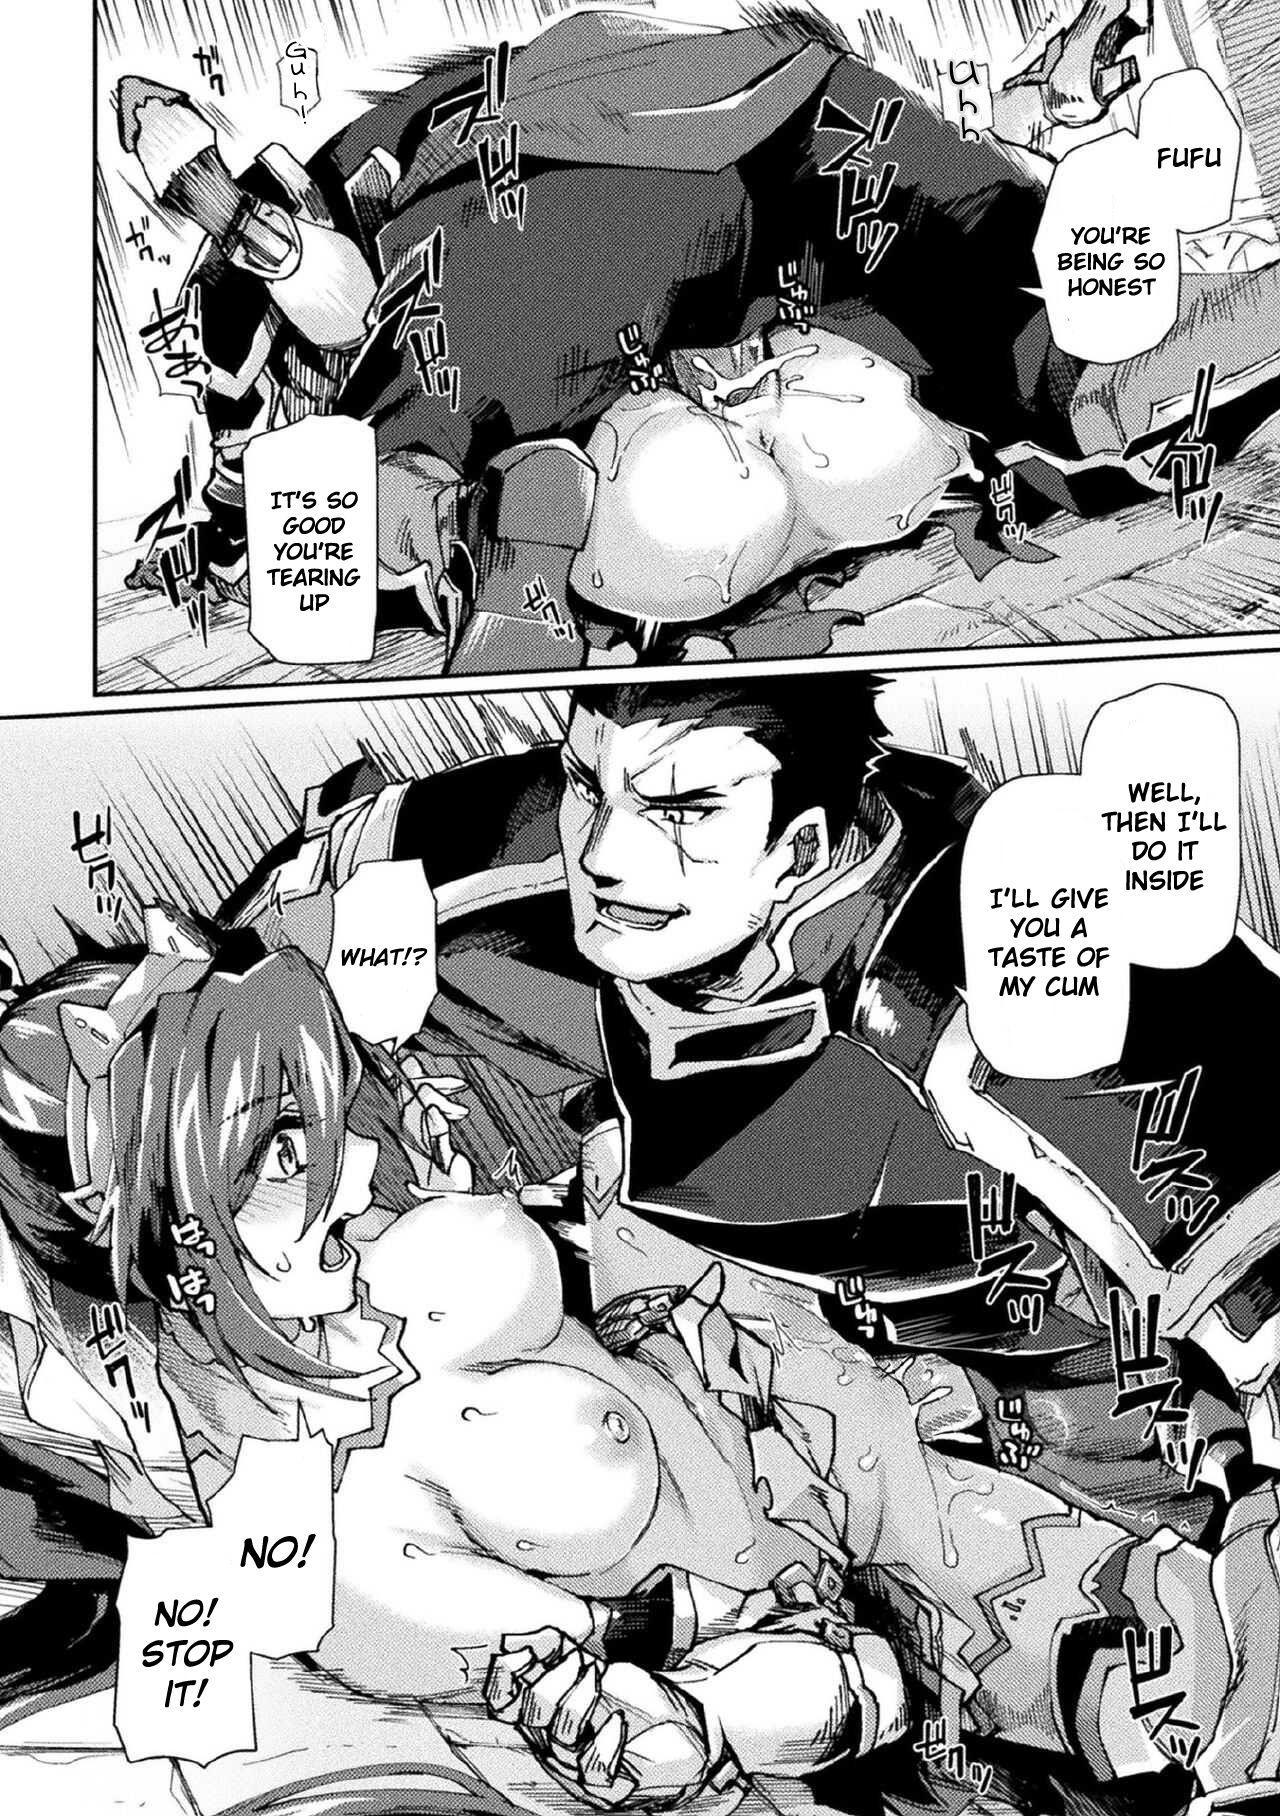 [Tsukitokage] Kuroinu II ~Inyoku ni Somaru Haitoku no Miyako, Futatabi~ THE COMIC Chapter 7 (Kukkoro Heroines Vol. 9) [English] [Decensored] (Klub Kemoner) [Digital] 11